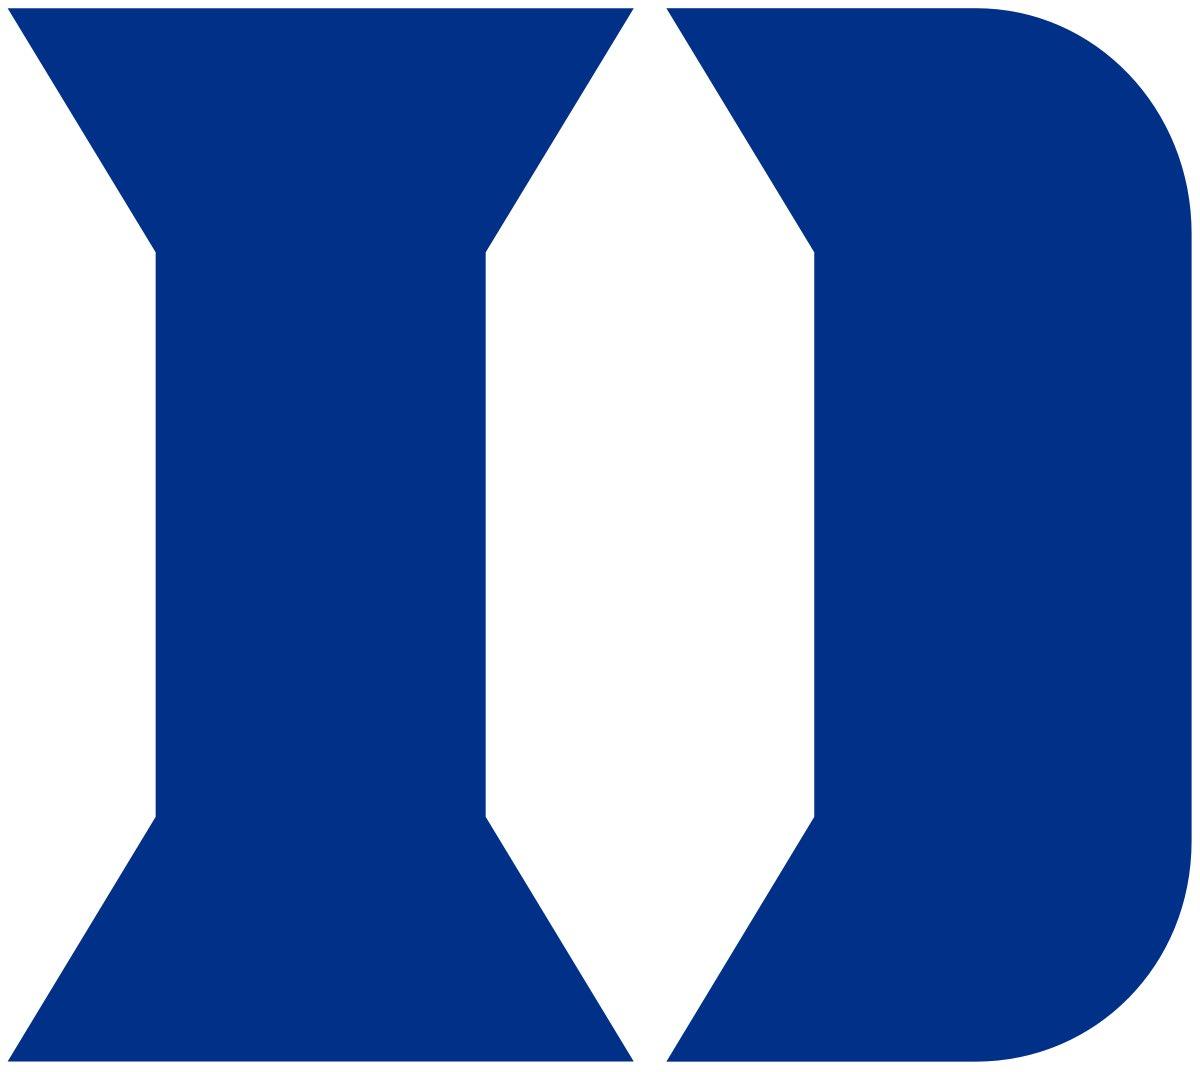 Extremely BLESSED & Honored to receive a scholarship offer from the prestigious DUKE UNIVERSITY!! 💙 #Dukegang4L @DukeFOOTBALL @DavidCutcliffe @dukecoachdj @MattGuerrieri @SWiltfong247 @RivalsFriedman @NCFootball18